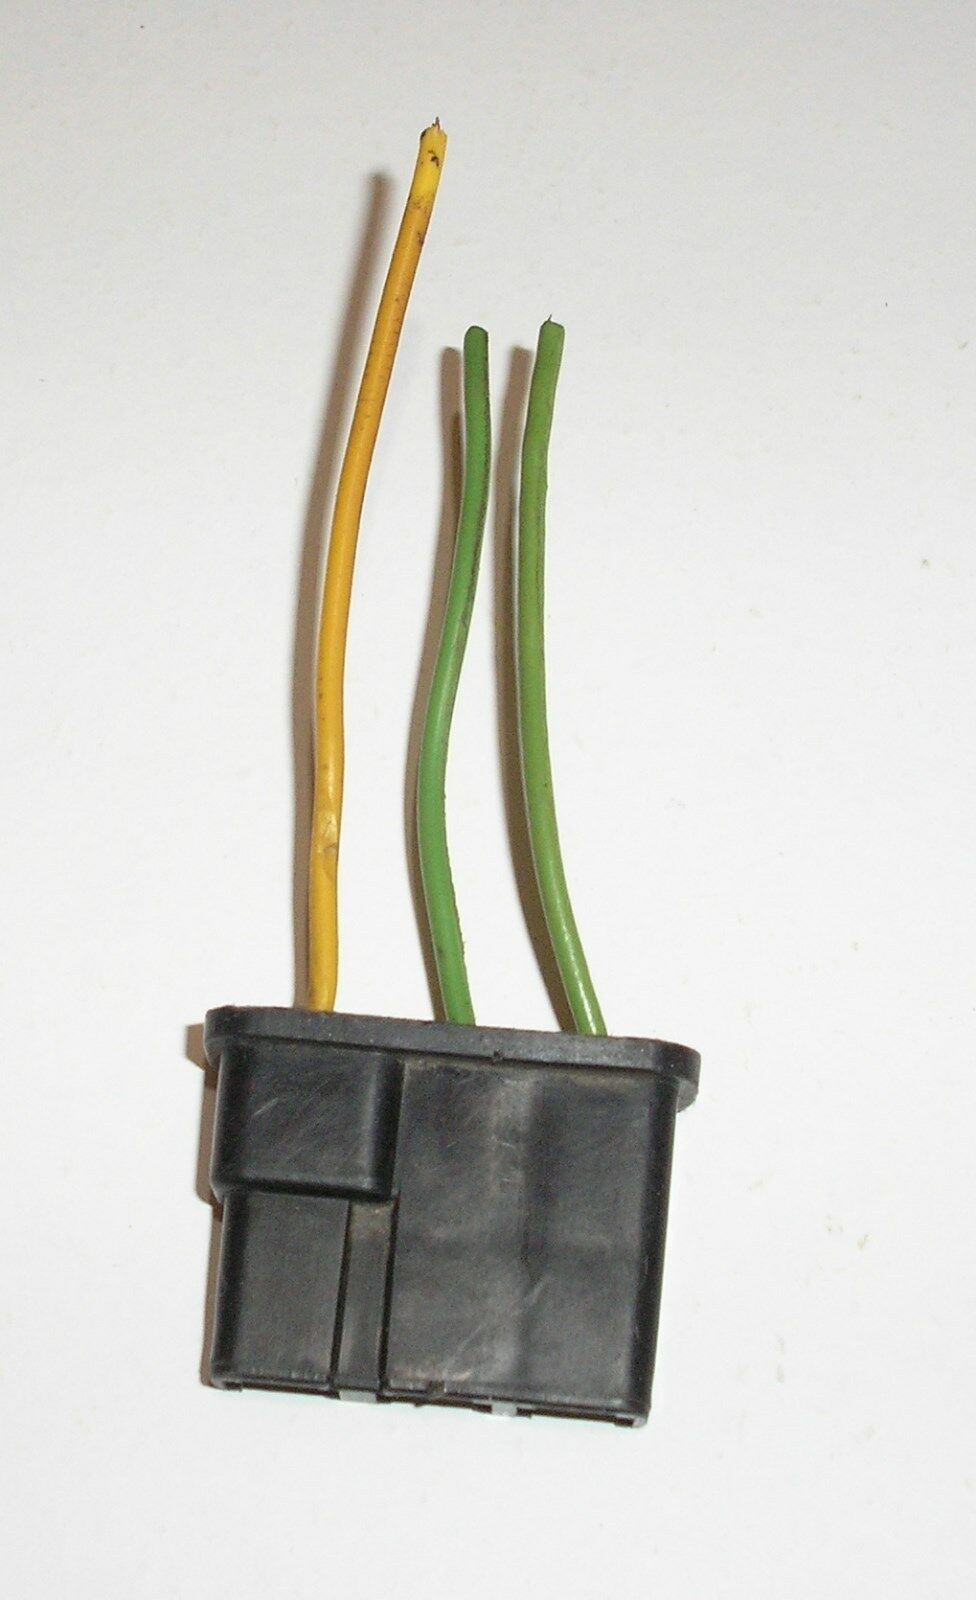 Ac Delco Radio Wiring Diagram Radio Wiring Harness Adapter